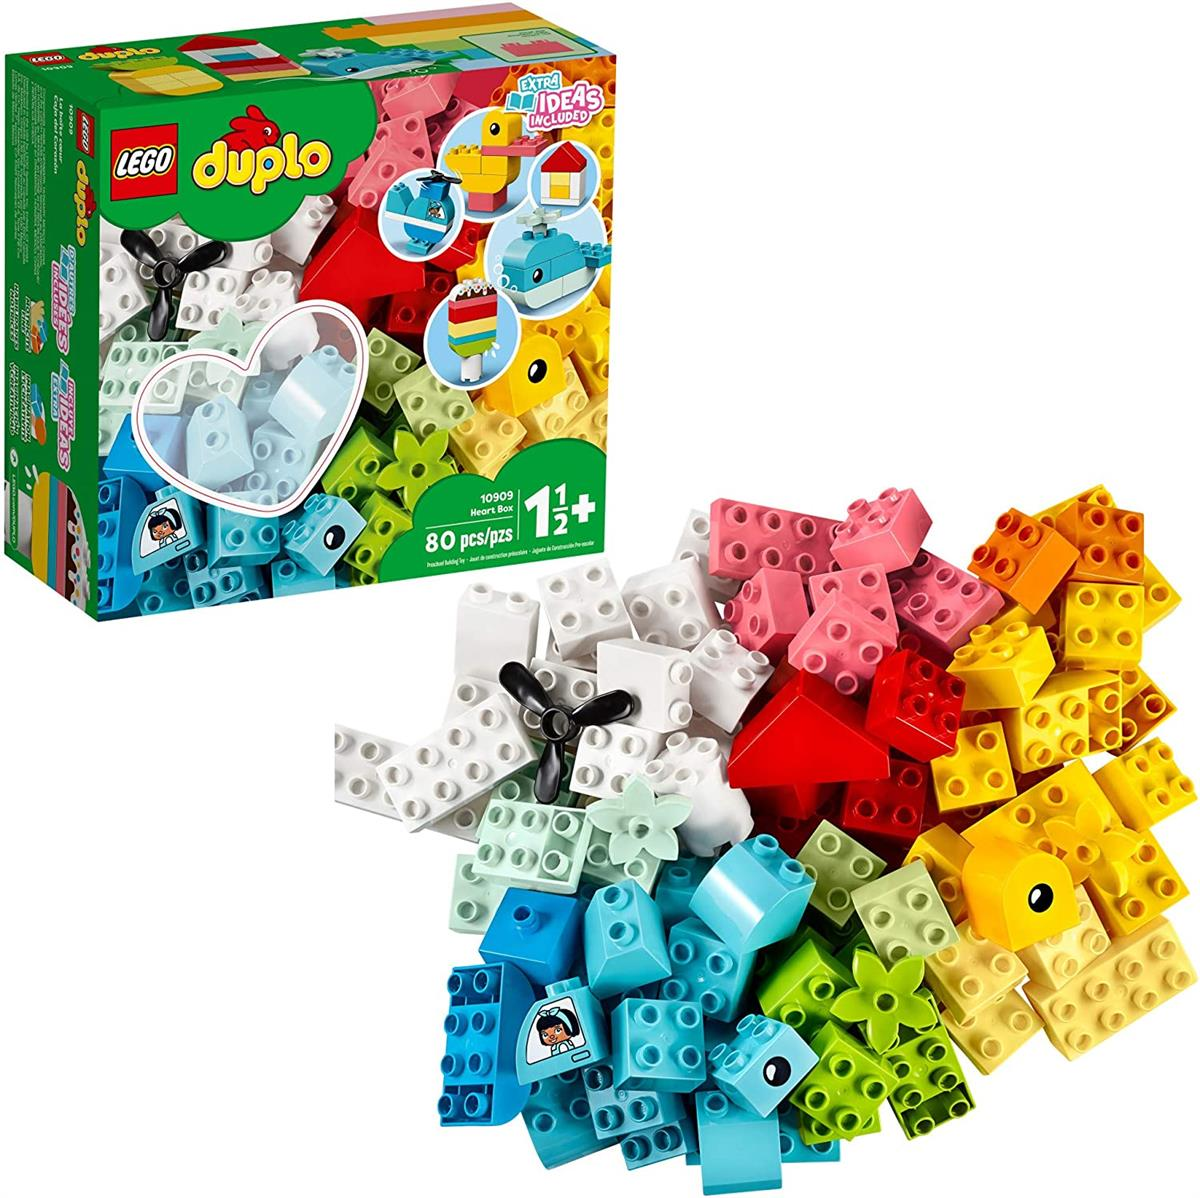 LEGO 10909 SCATOLA CUORE